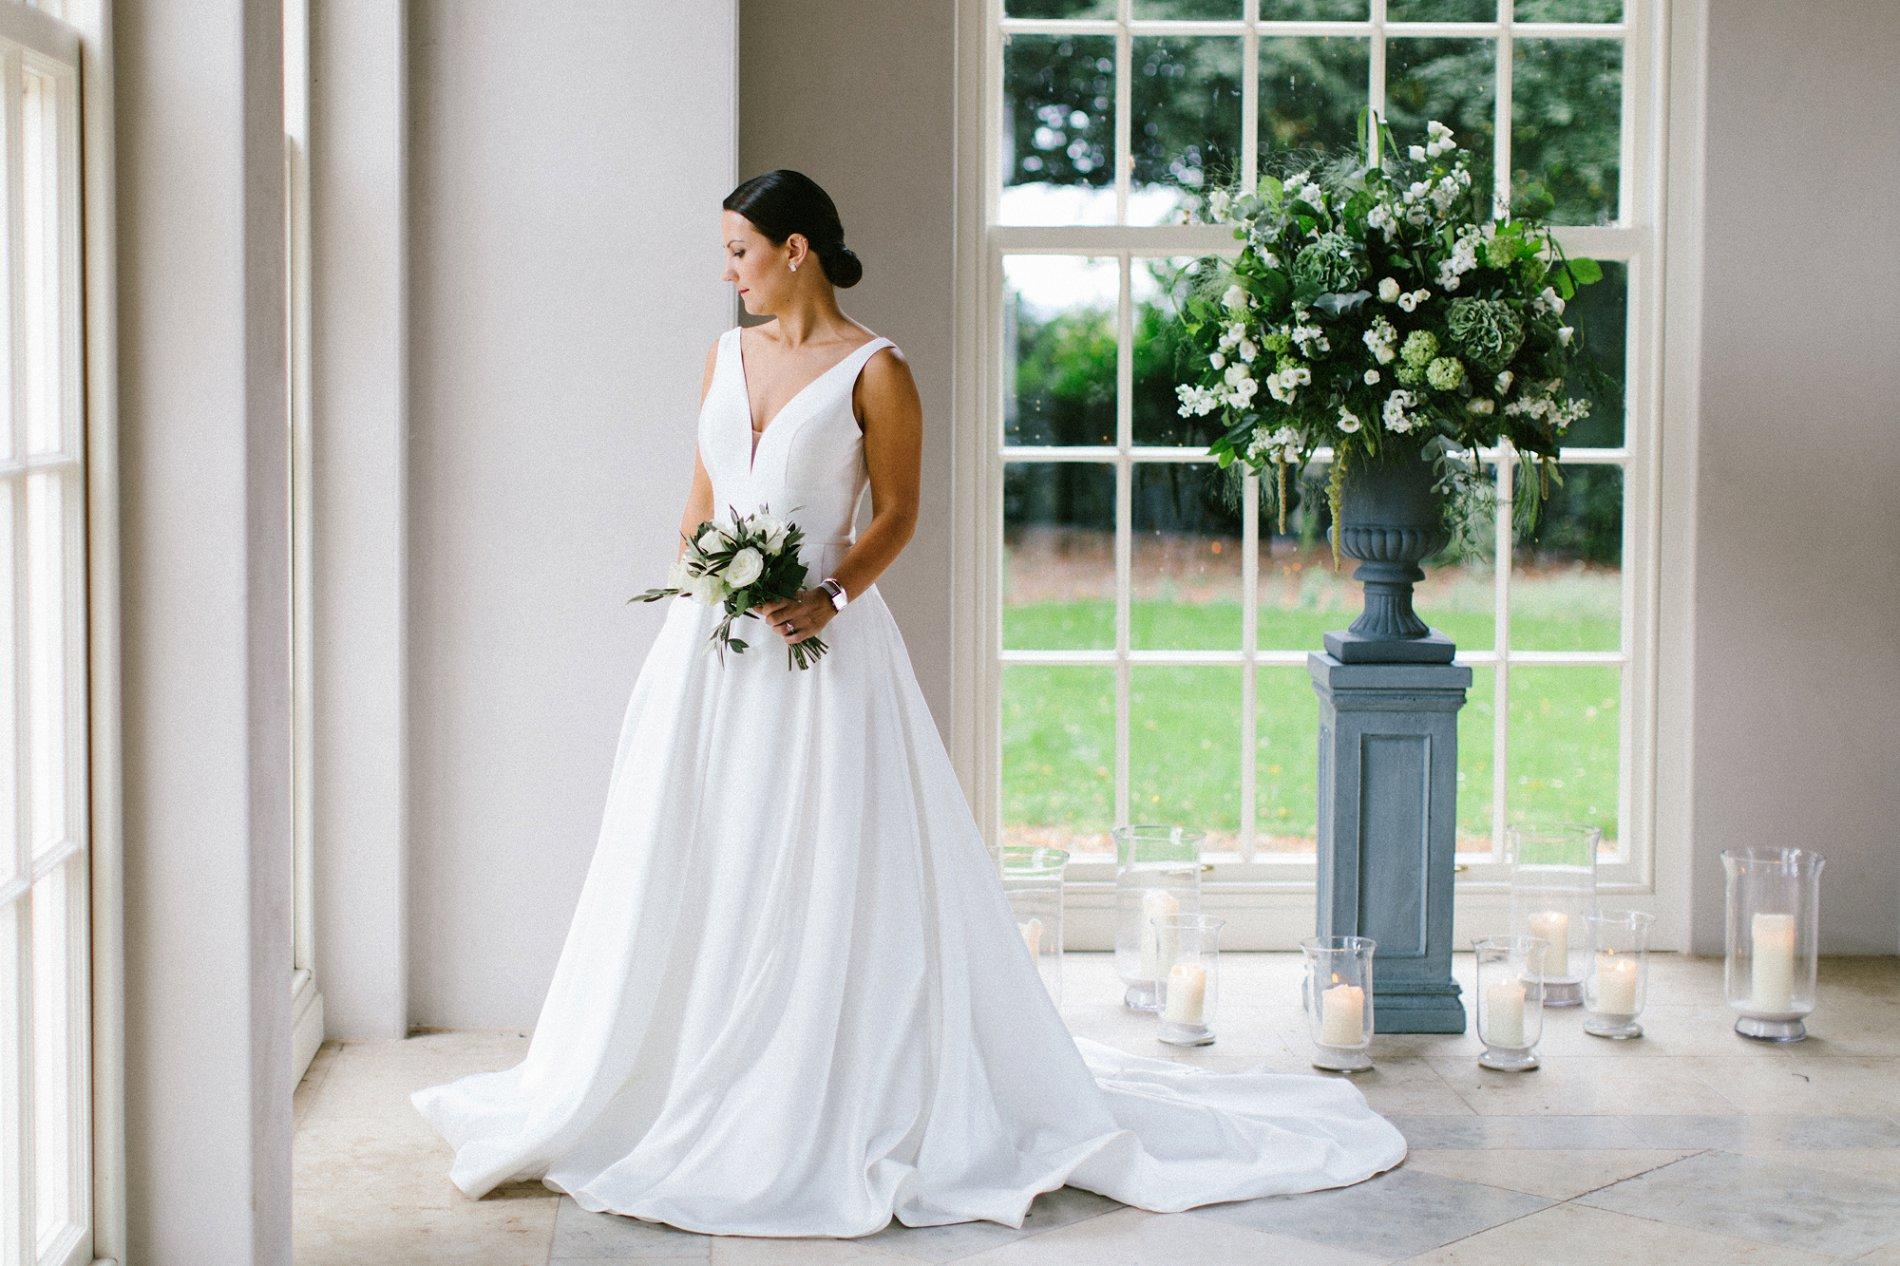 An Intimate Fine Art Wedding Shoot at Newby Hall (c) Melissa Beattie Photography (5)